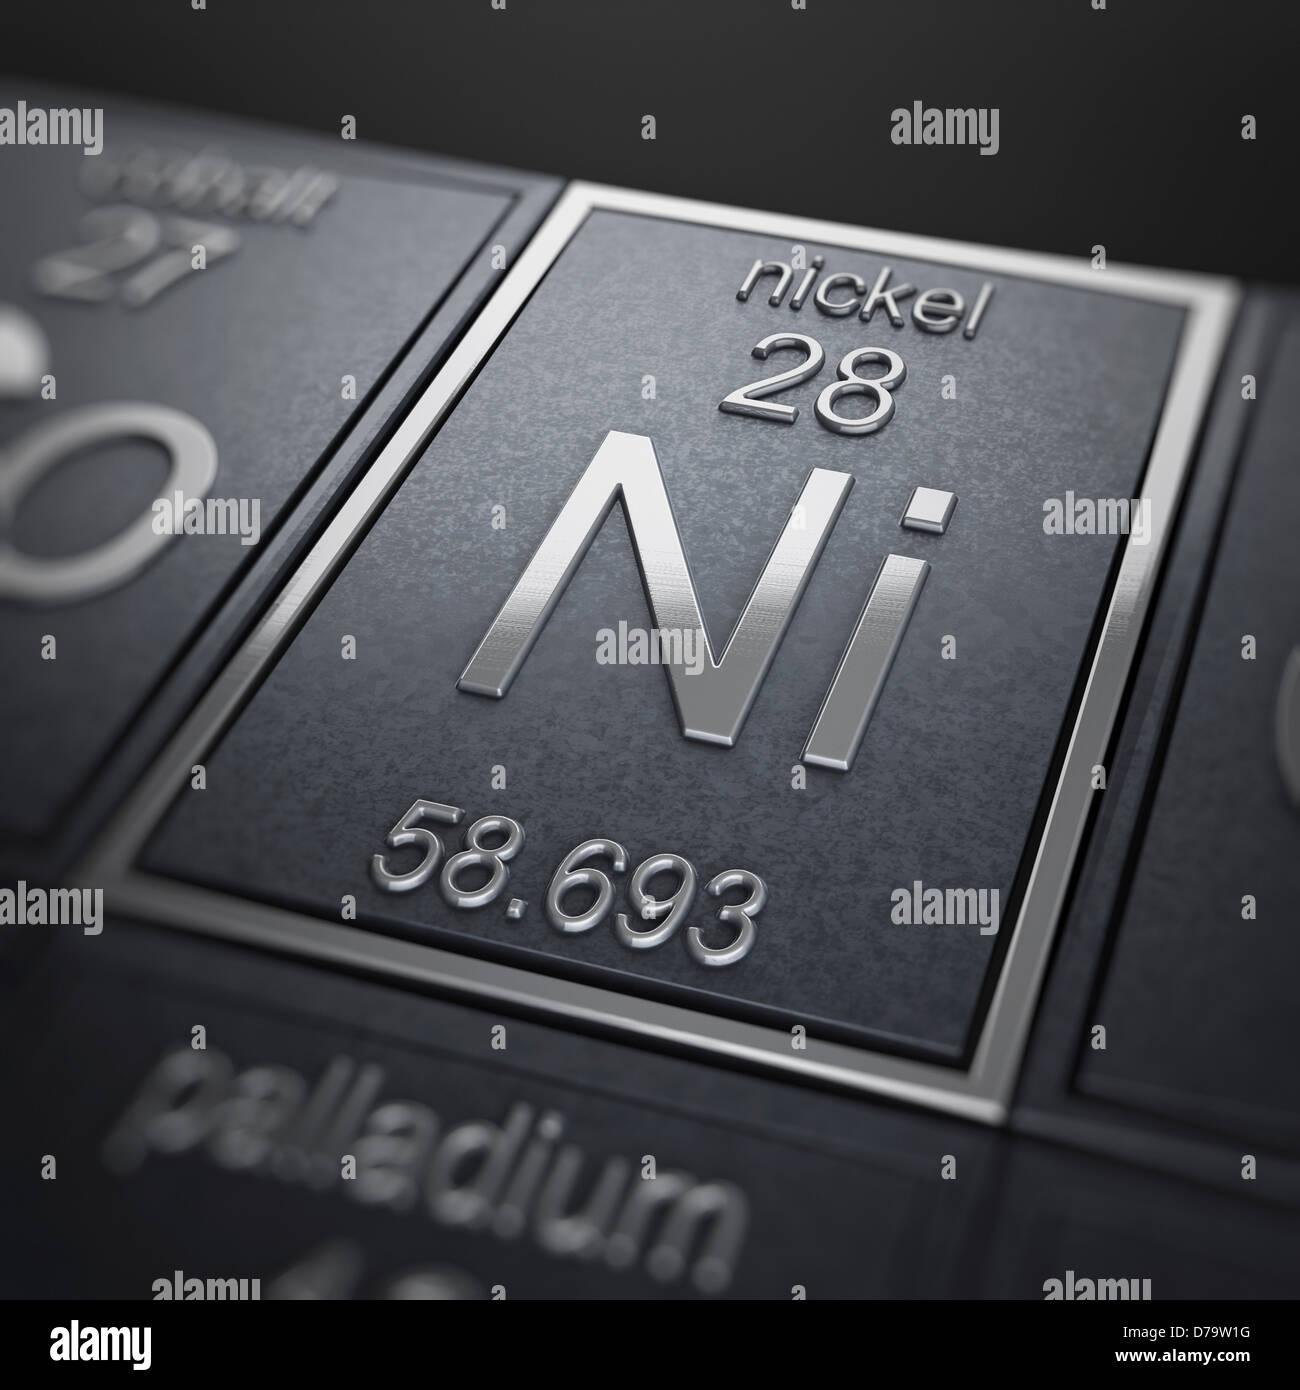 Nickel chemical element stock photo 56150908 alamy nickel chemical element buycottarizona Images